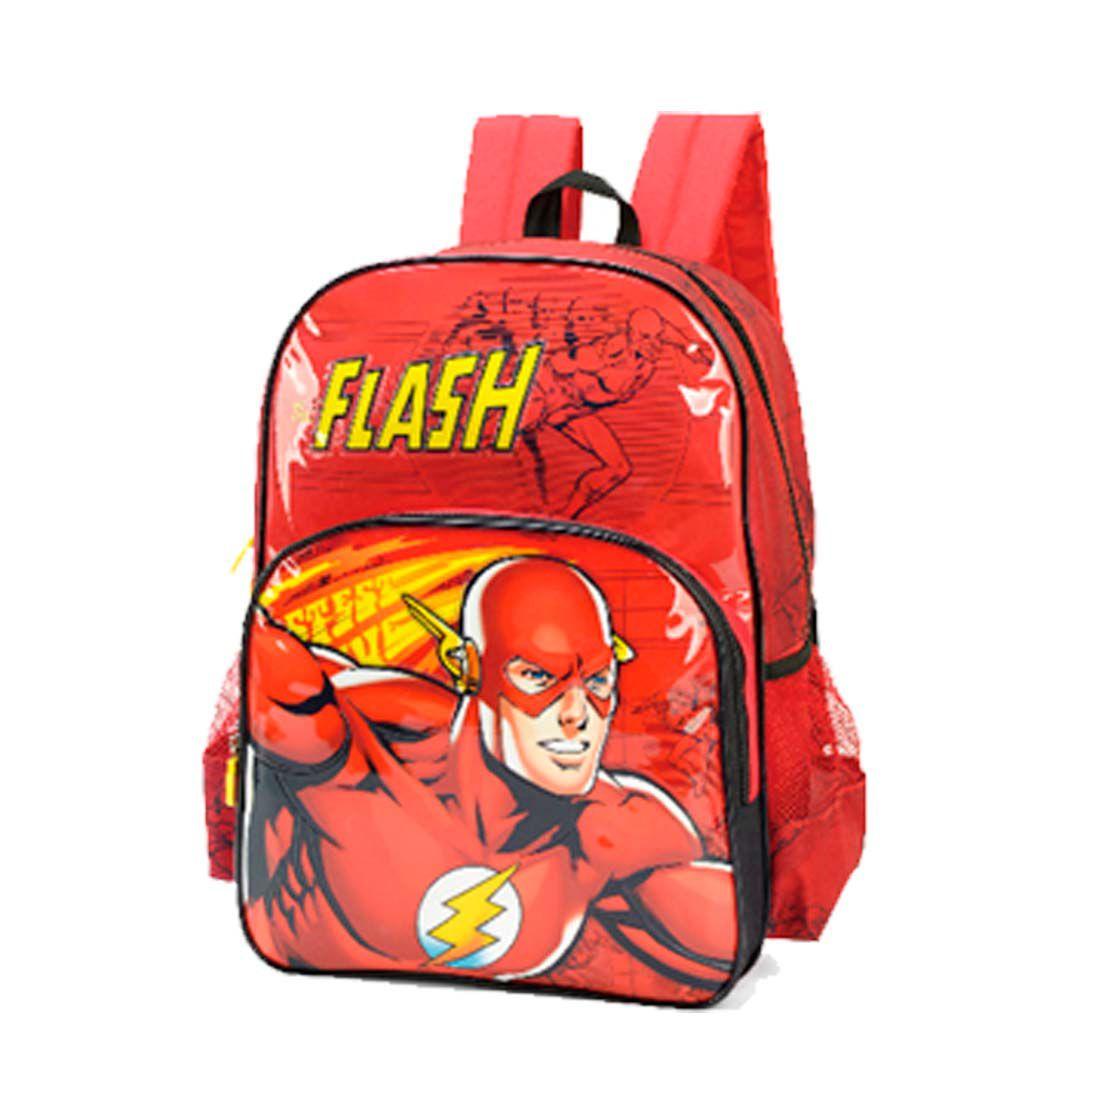 Mochila Infantil Flash IS34271FM